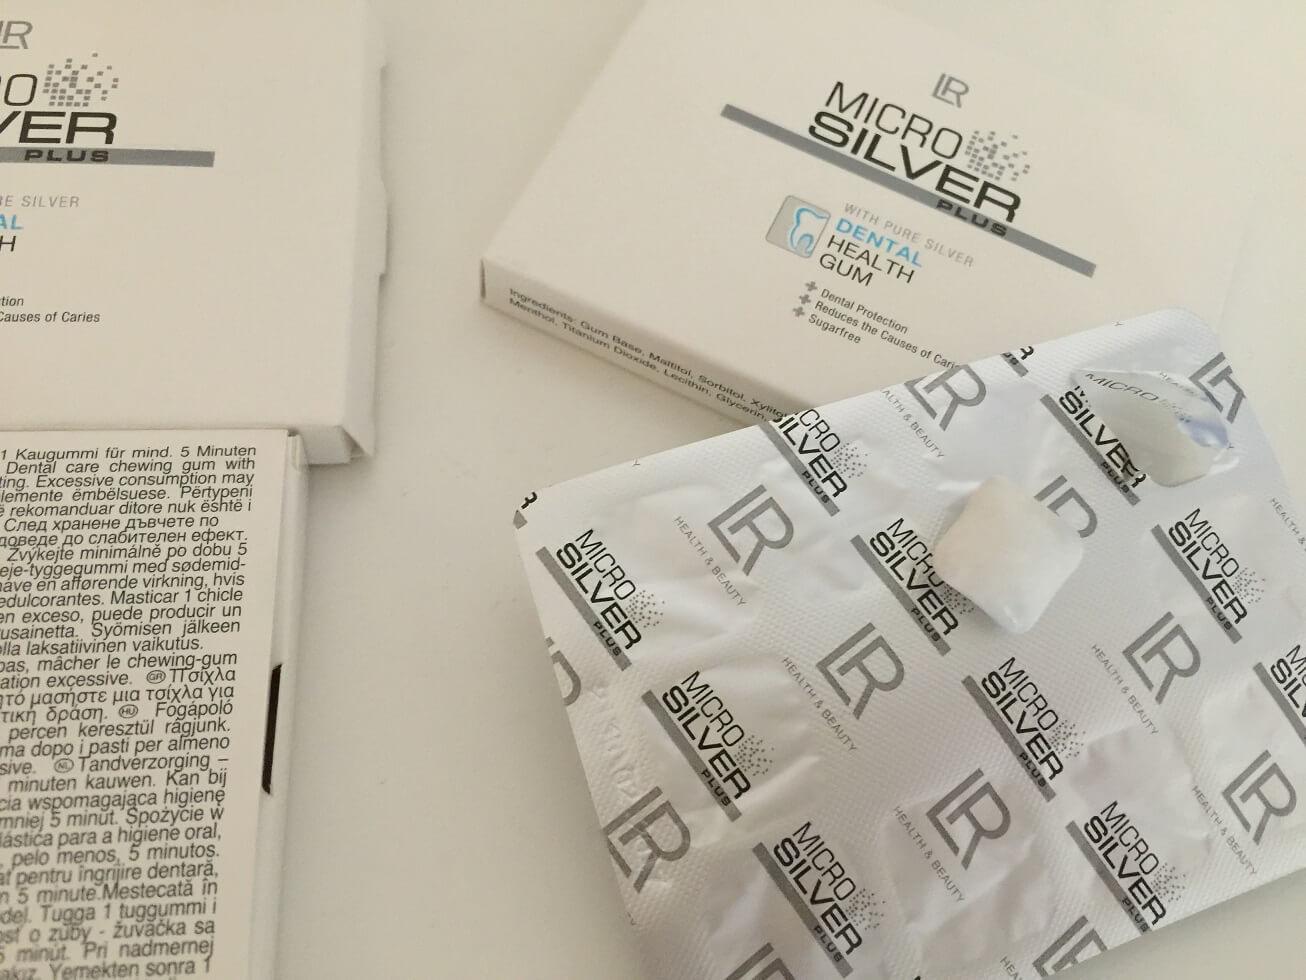 LR Microsilver Plus Zahnpflege Kaugummi Einzeln